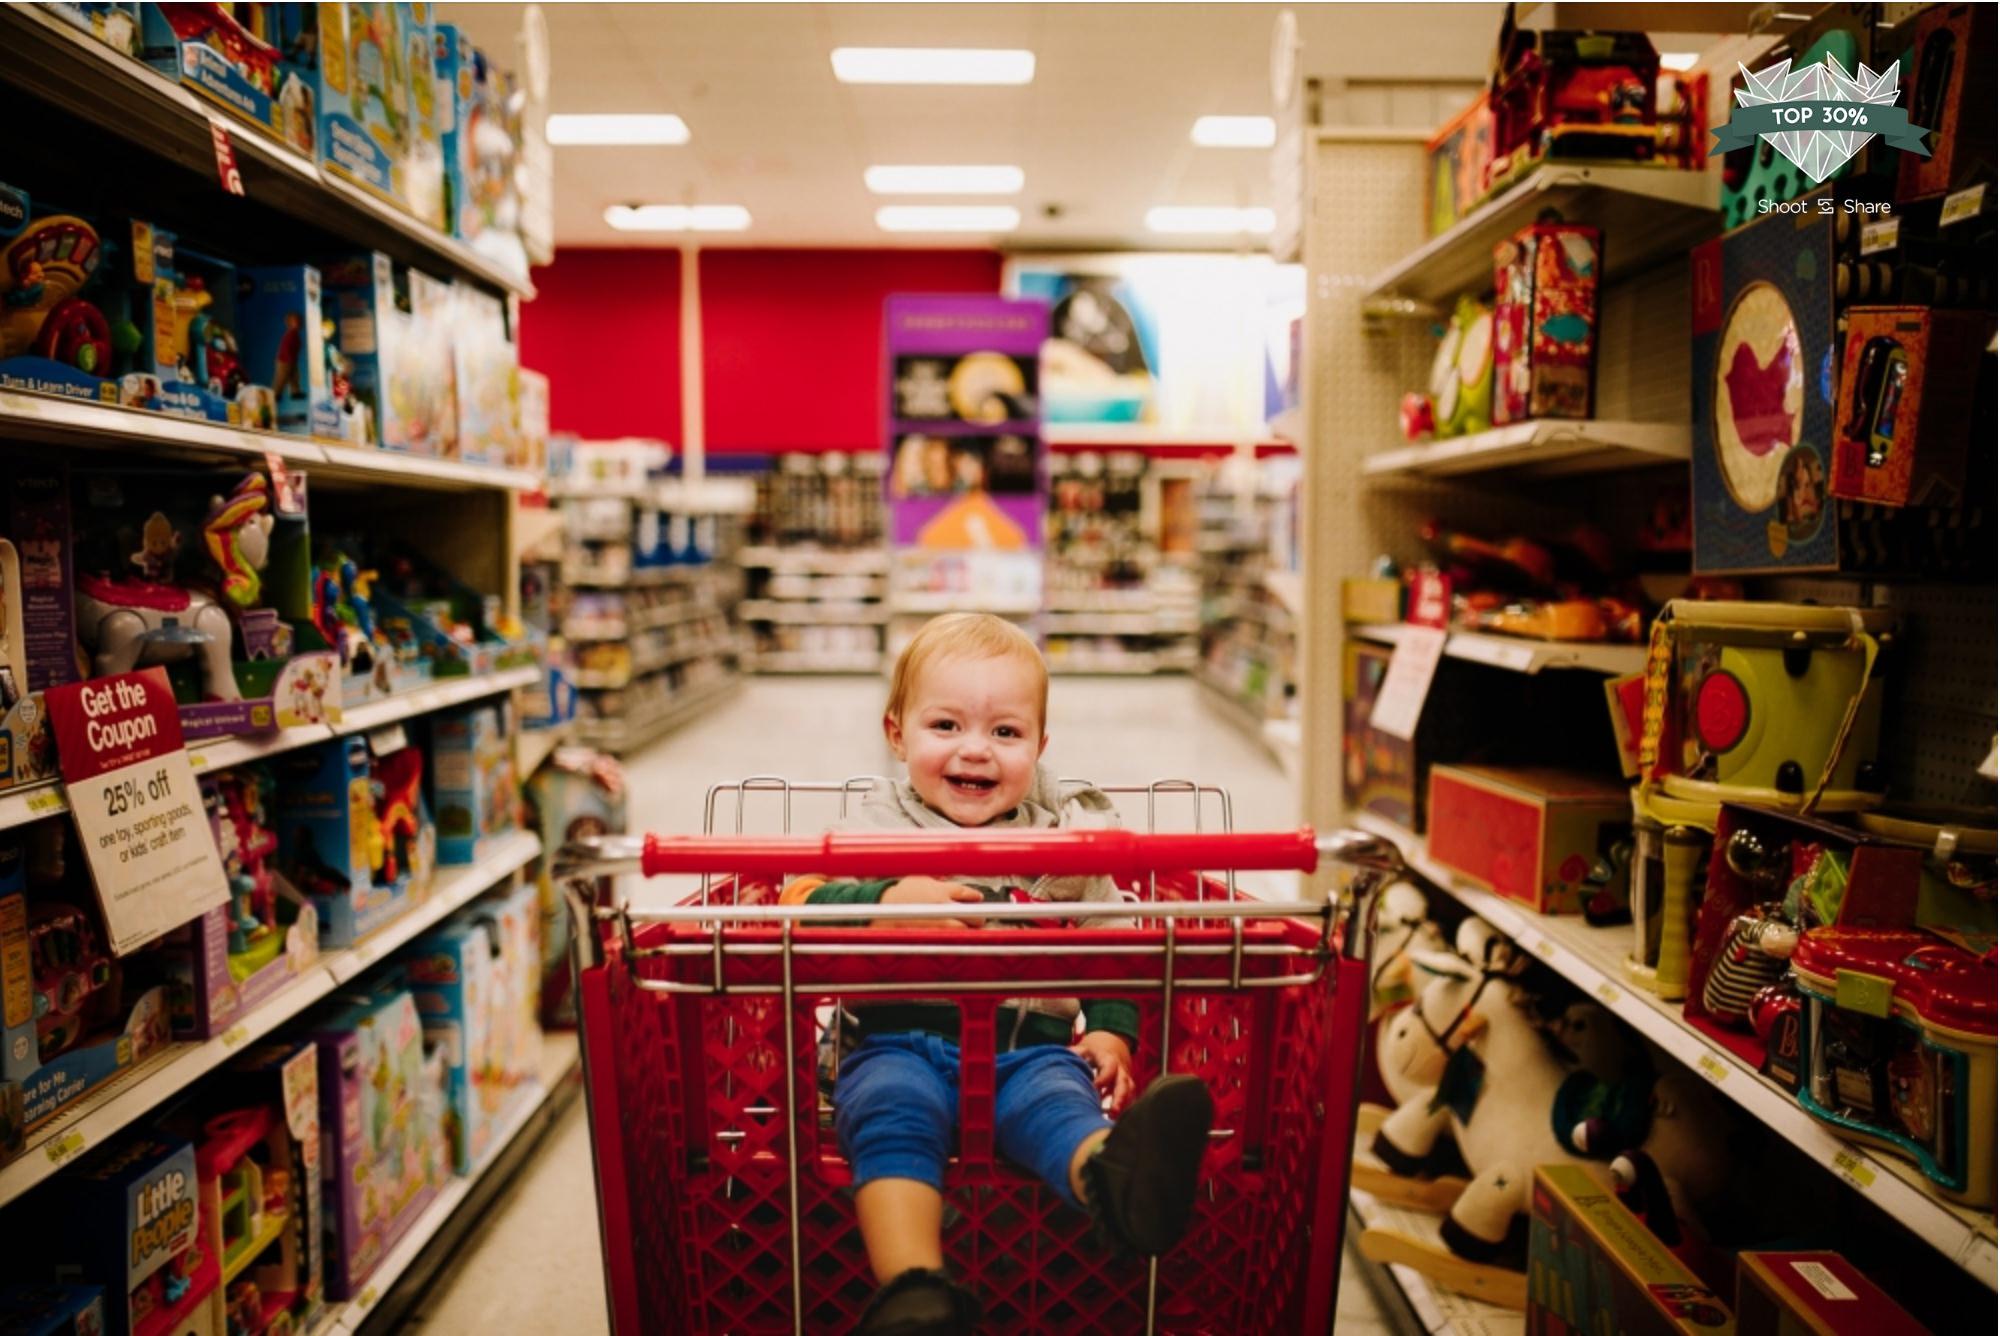 Archer Inspired Photography Shoot and Share Family Wedding Lifestyle Photographer Morgan Hill California San Francisco Bay Area-13.jpg